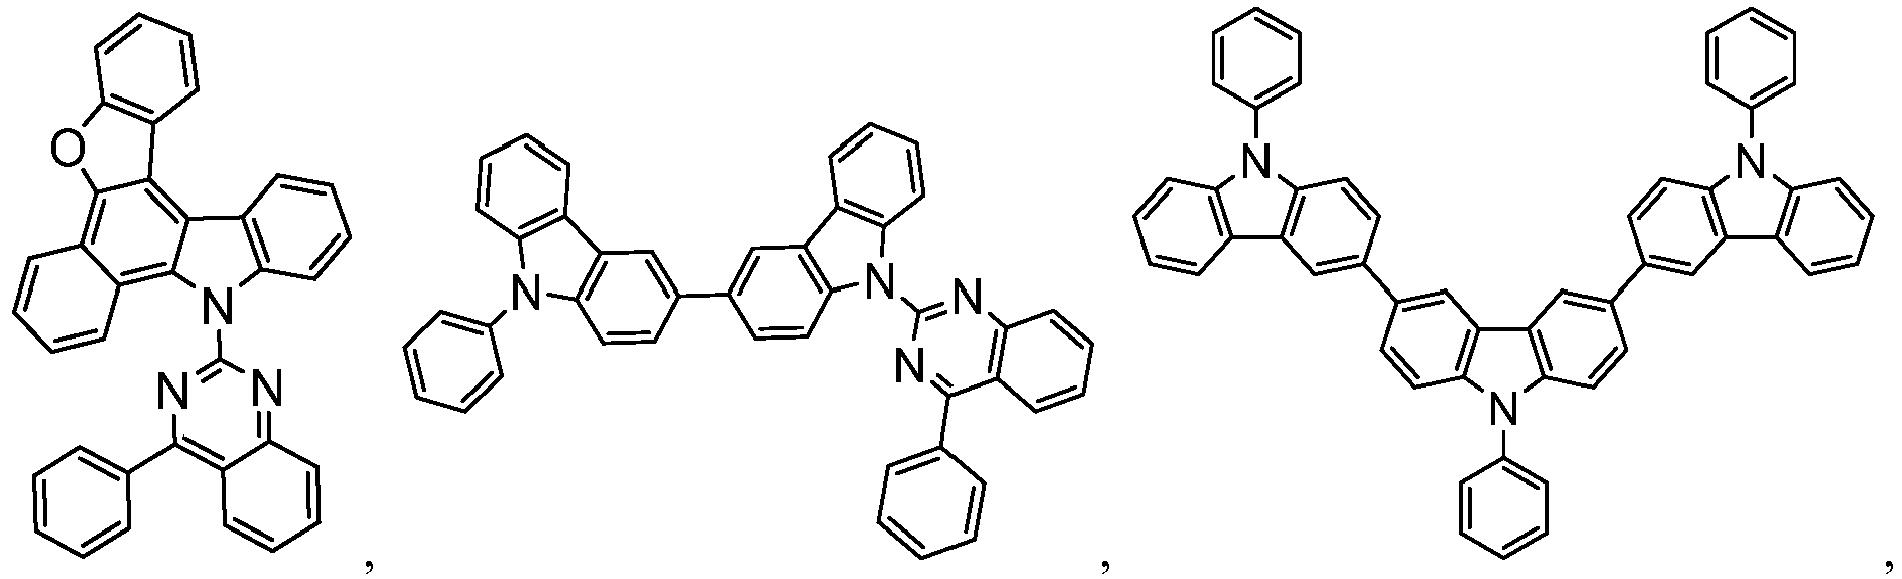 Figure imgb0984